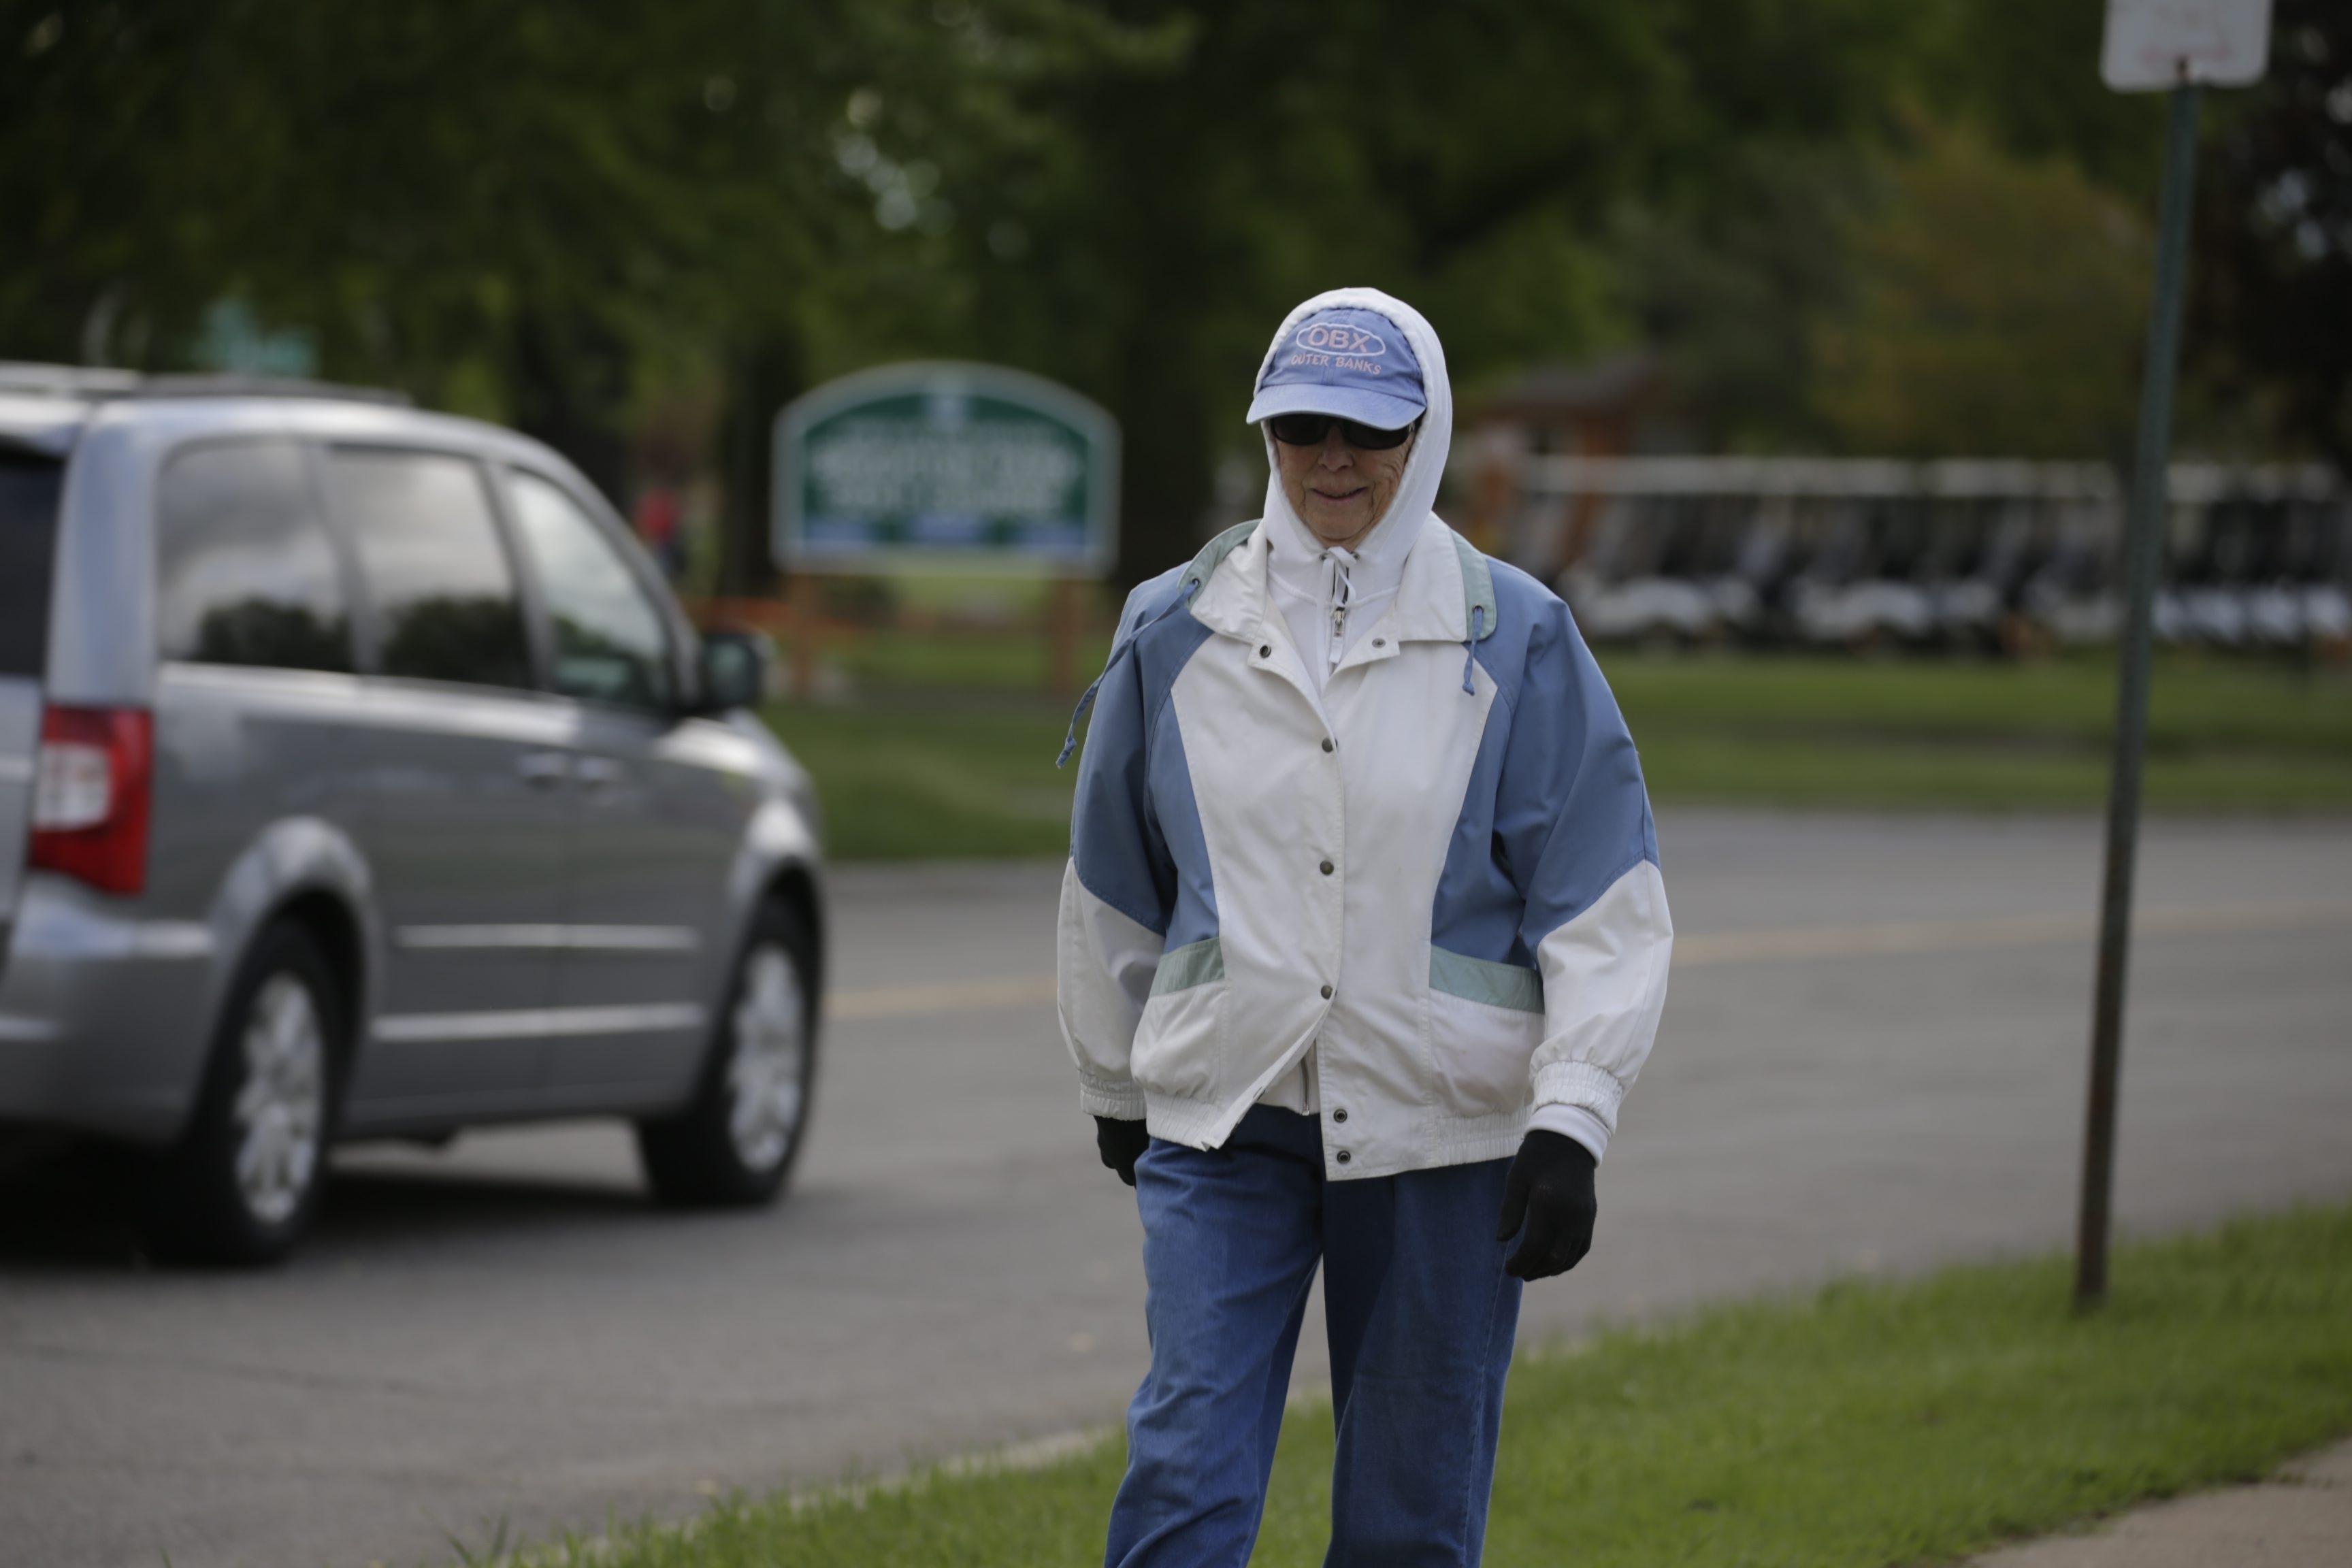 Delores Kellner takes her morning walk on  Brompton Road in Town of Tonawanda, N.Y., on Tuesday, May 19, 2015.   (John Hickey/Buffalo News)